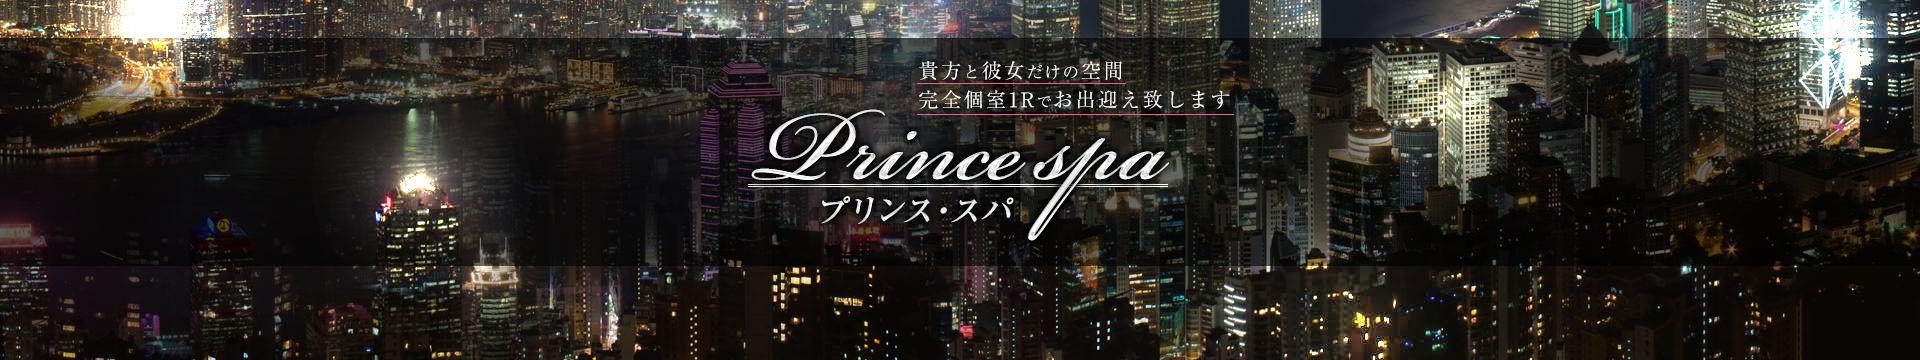 Prince spa プリンス スパ